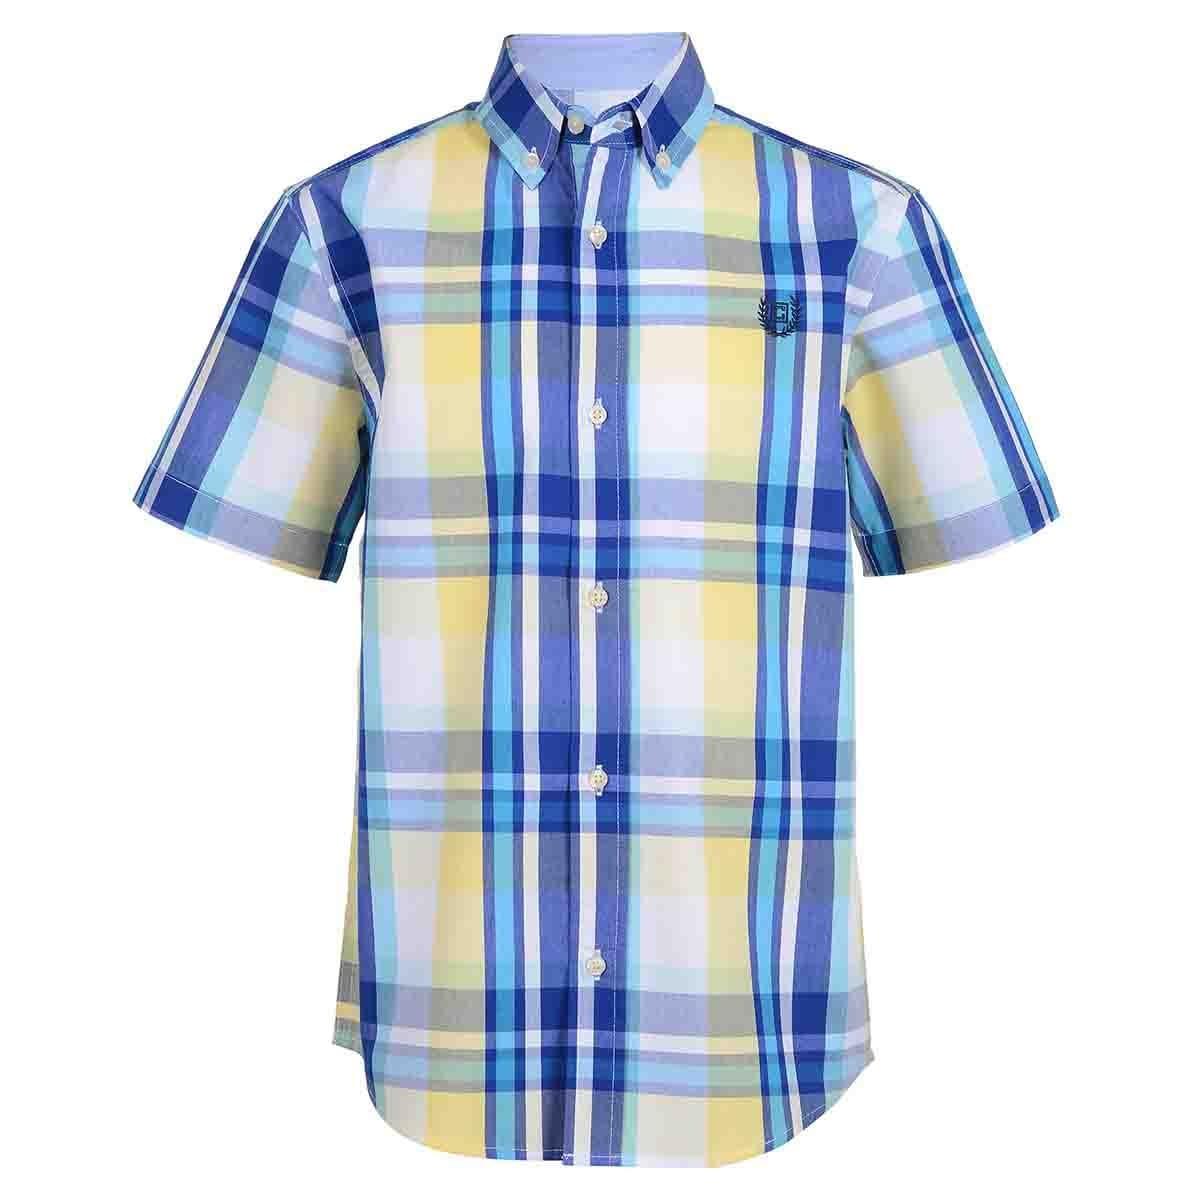 Camisa Casual Manga Corta Aden Chaps